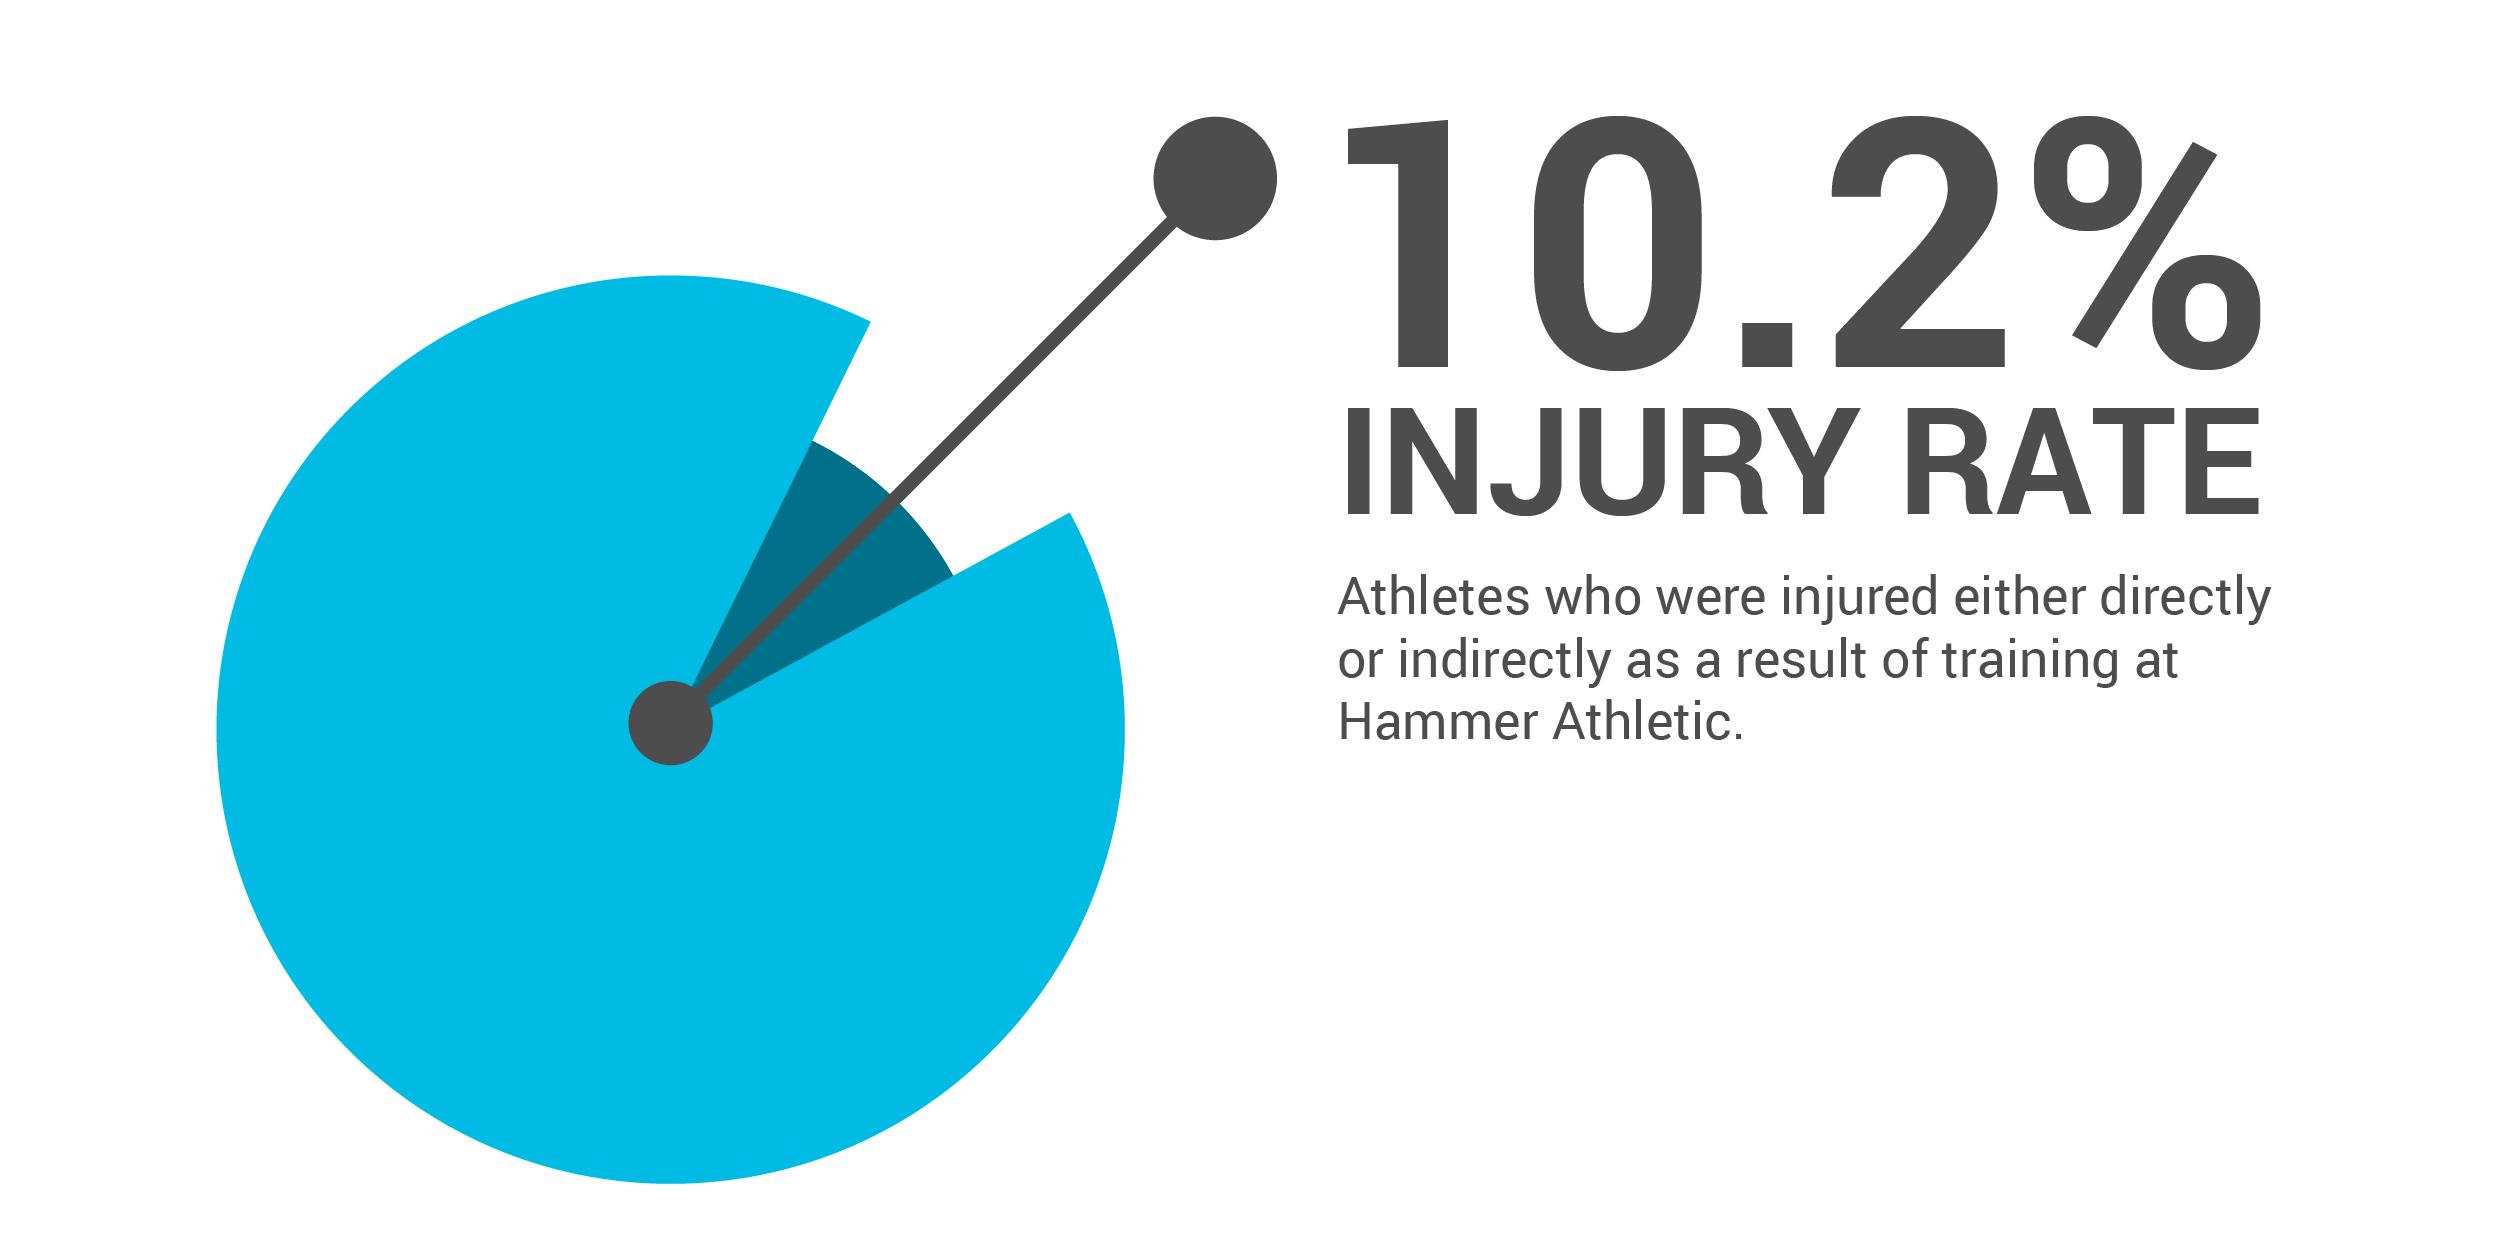 Injury Rate